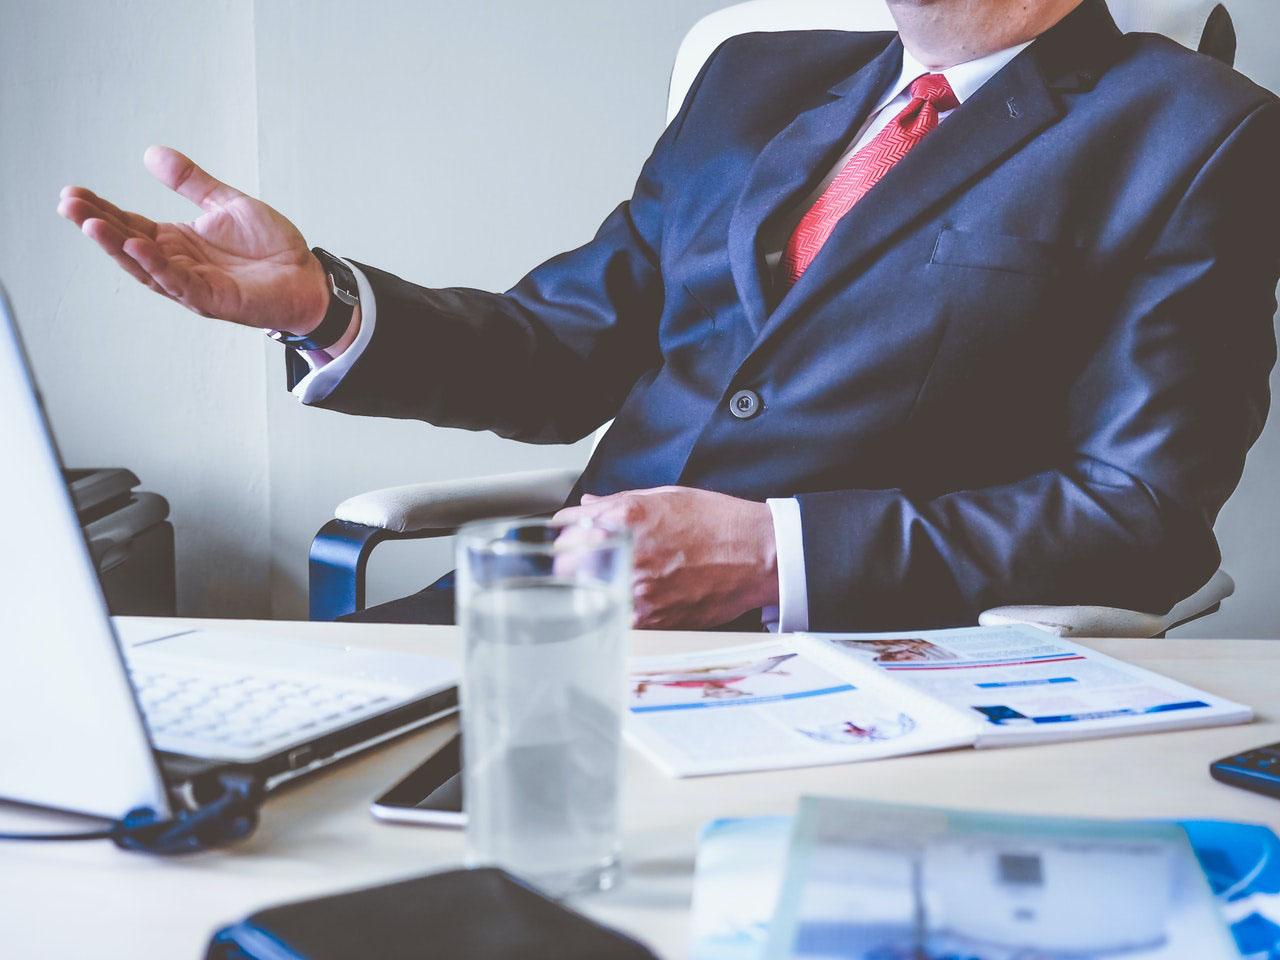 consultancy service business ideas